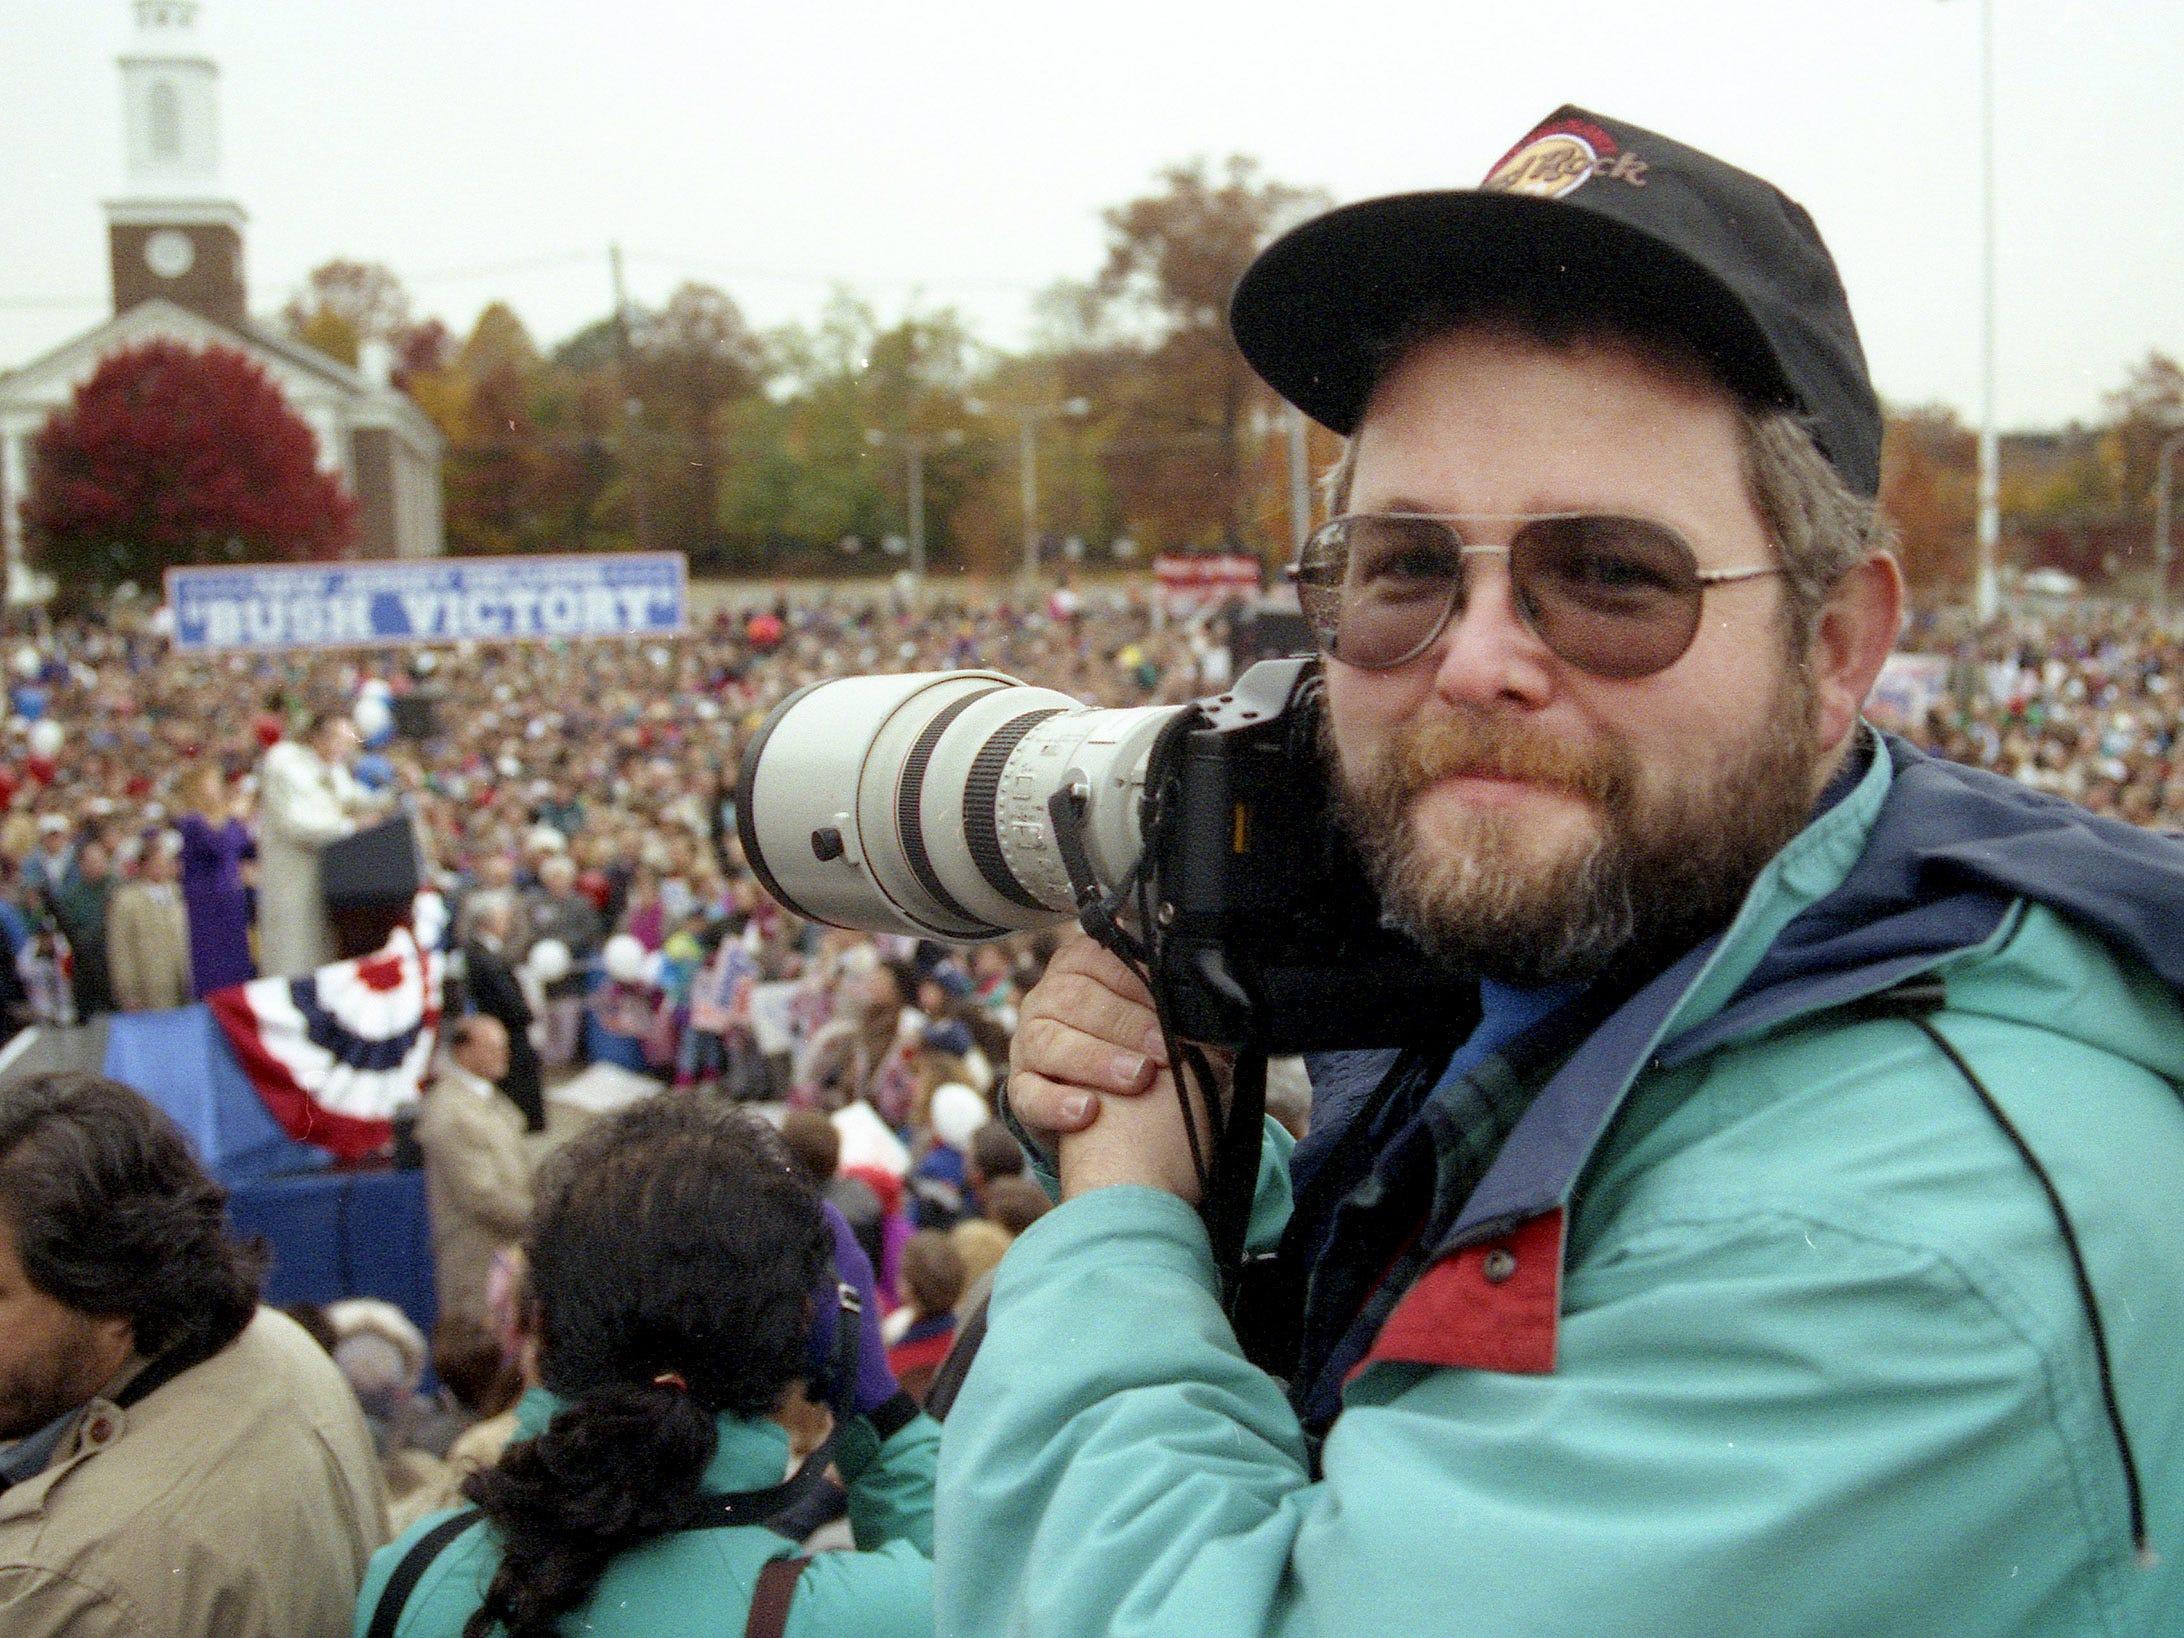 Asbury Park Press Staff Photographer Thomas P. Costello photographs President George HW Bush's election eve rally in Madison, NJ, on November 2, 1992.